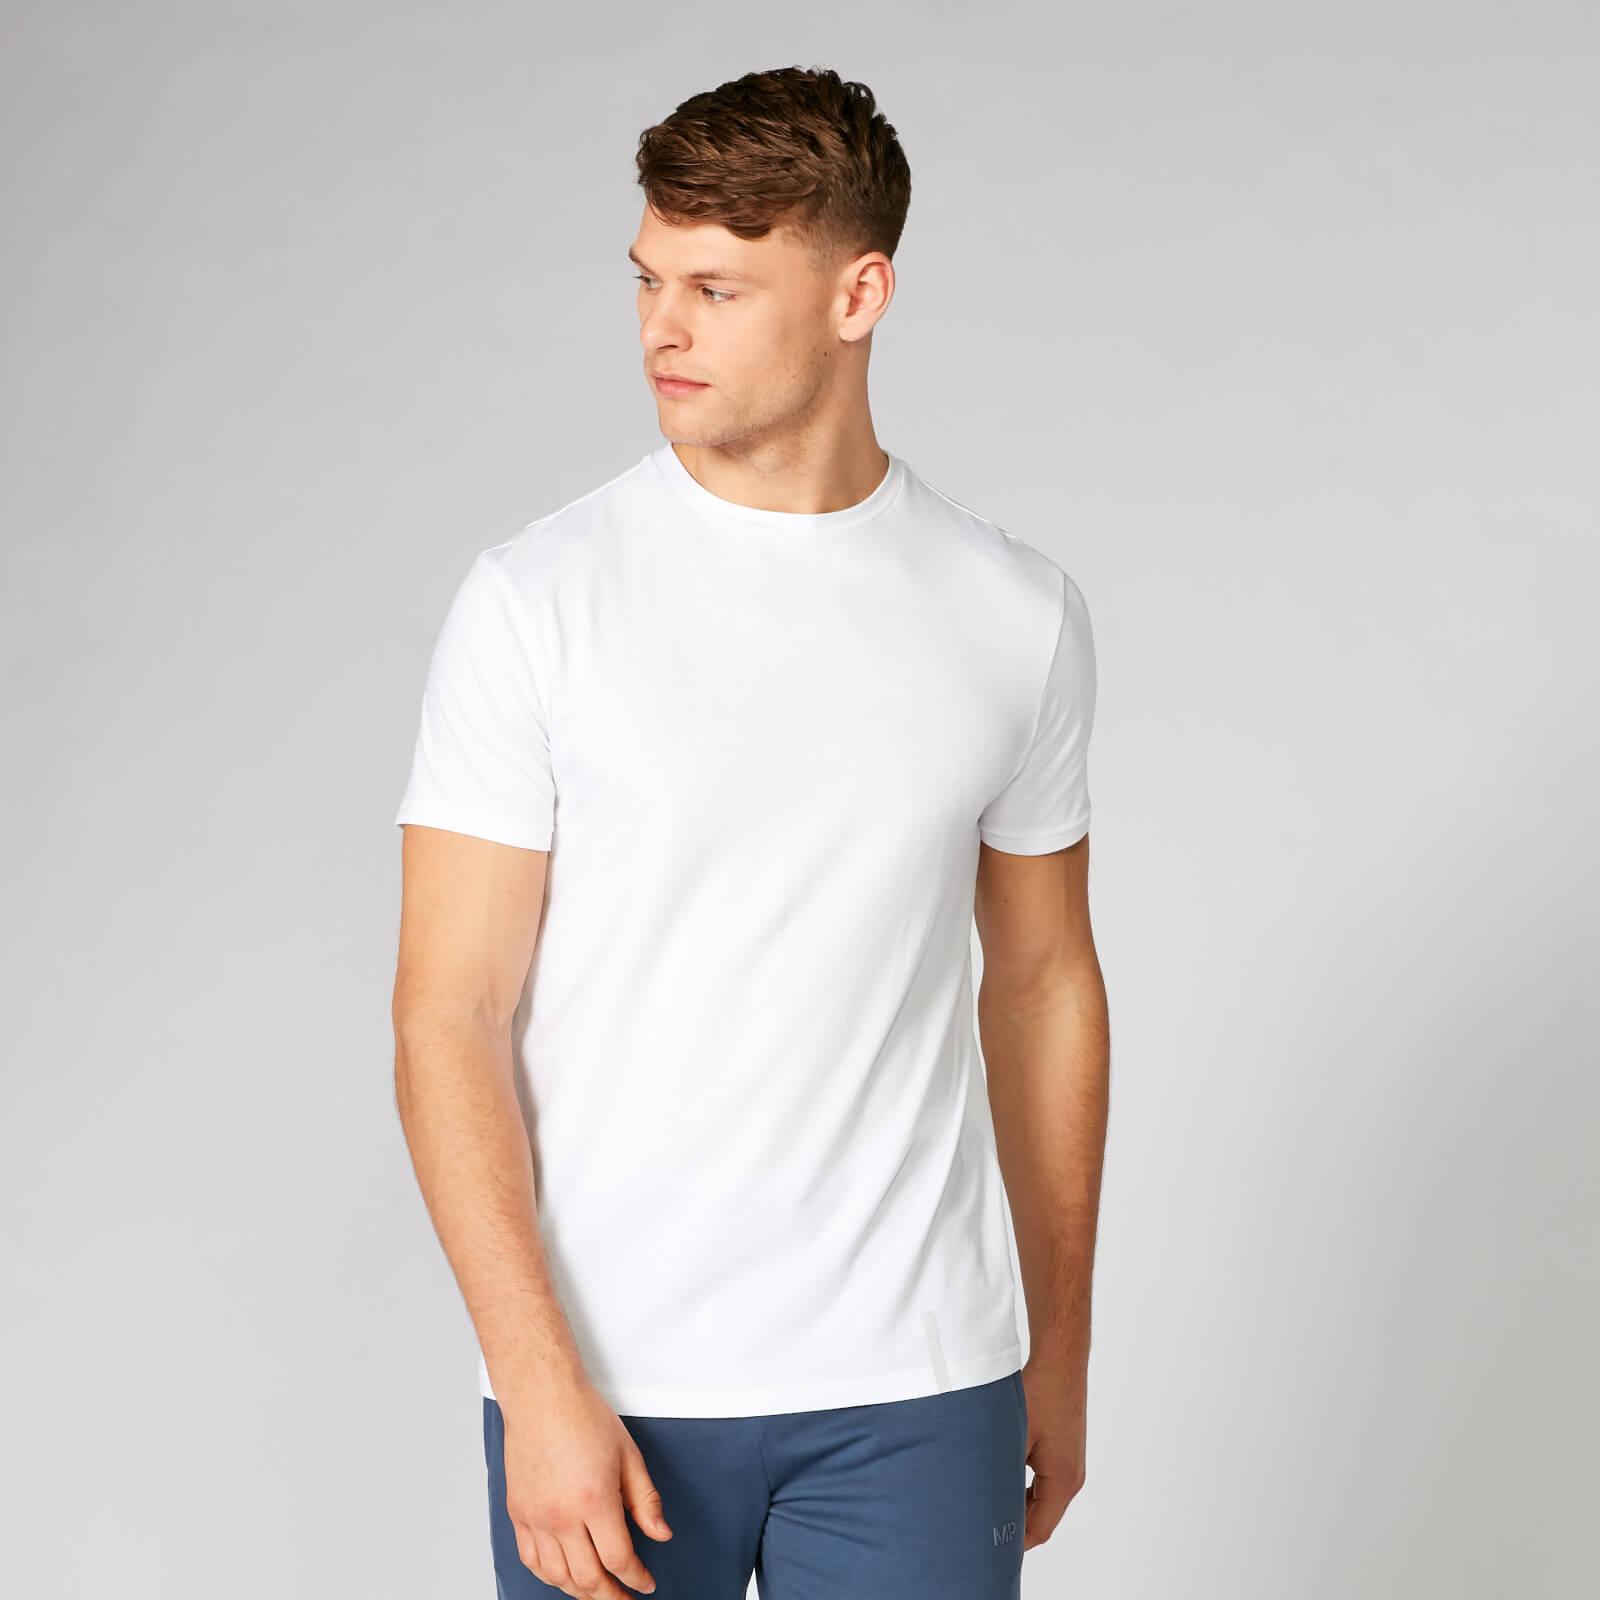 Myprotein Luxe Classic Crew T-Shirt - White - XL